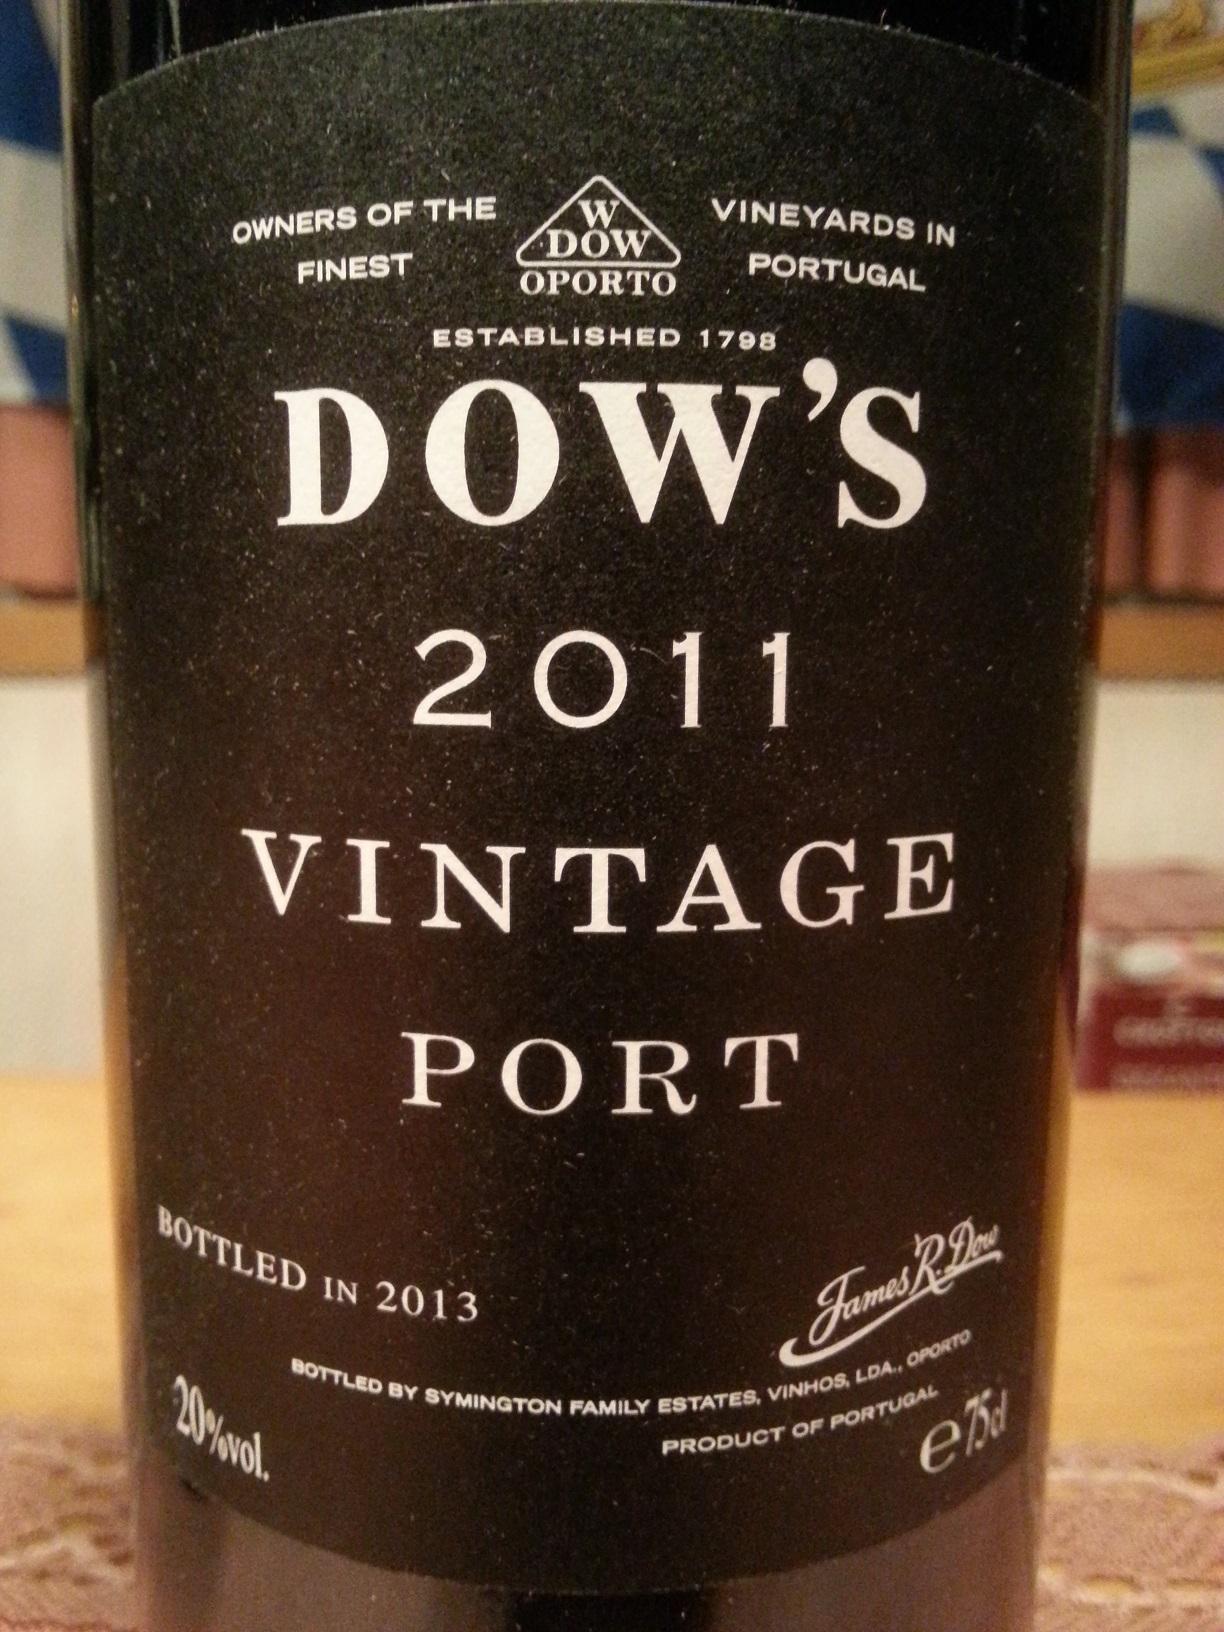 2011 Vintage Port | Dow's